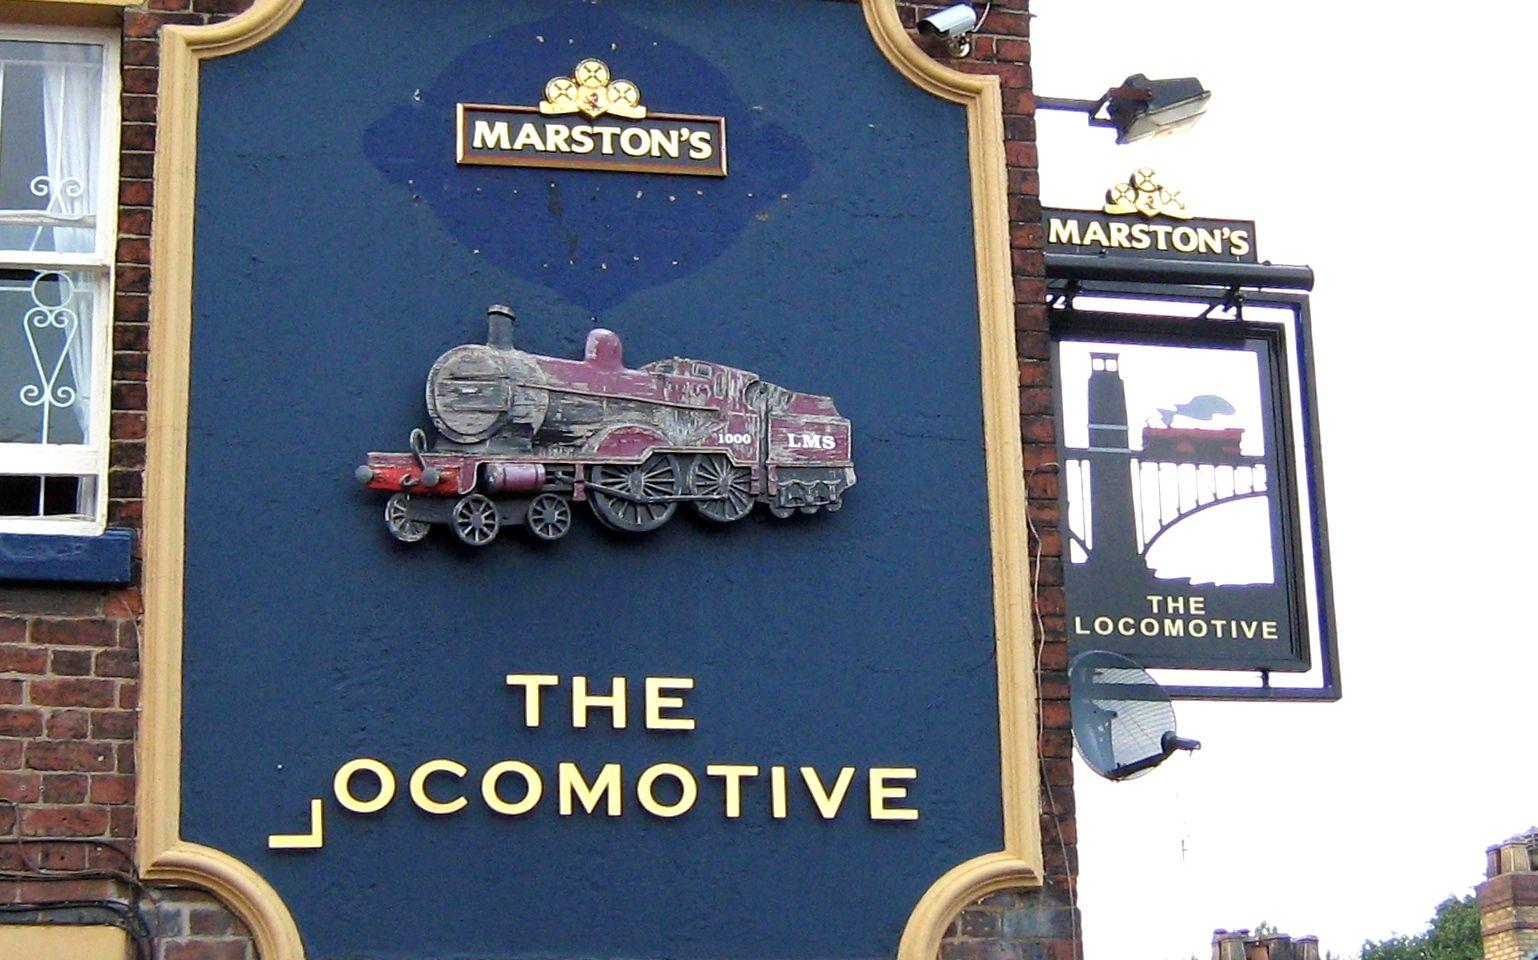 The Locomotive Pub Signs Store Signs British Pub